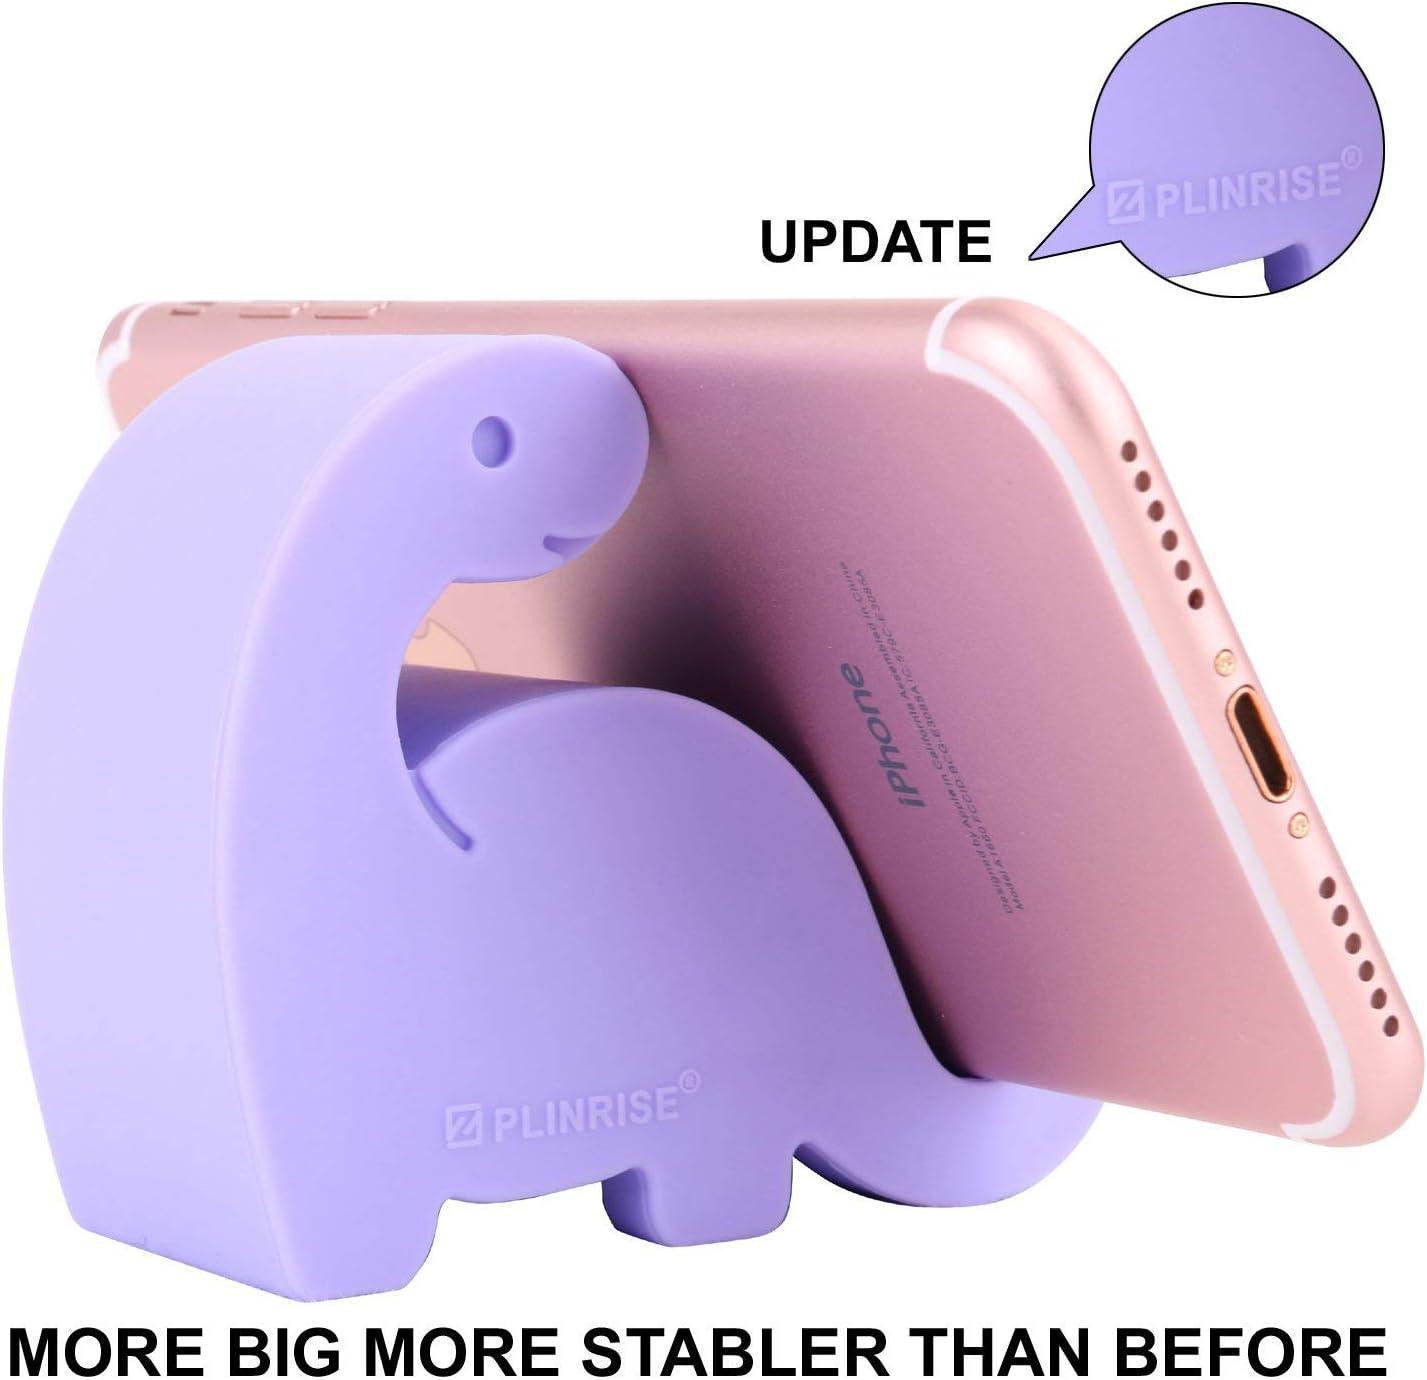 MISIXILE Desktop Cell Phone Stand Holder,Cute Animal Cell Phone Stand,Monkey Shape Cell Phone Holder,Adjustable Phone Supporter for Desk